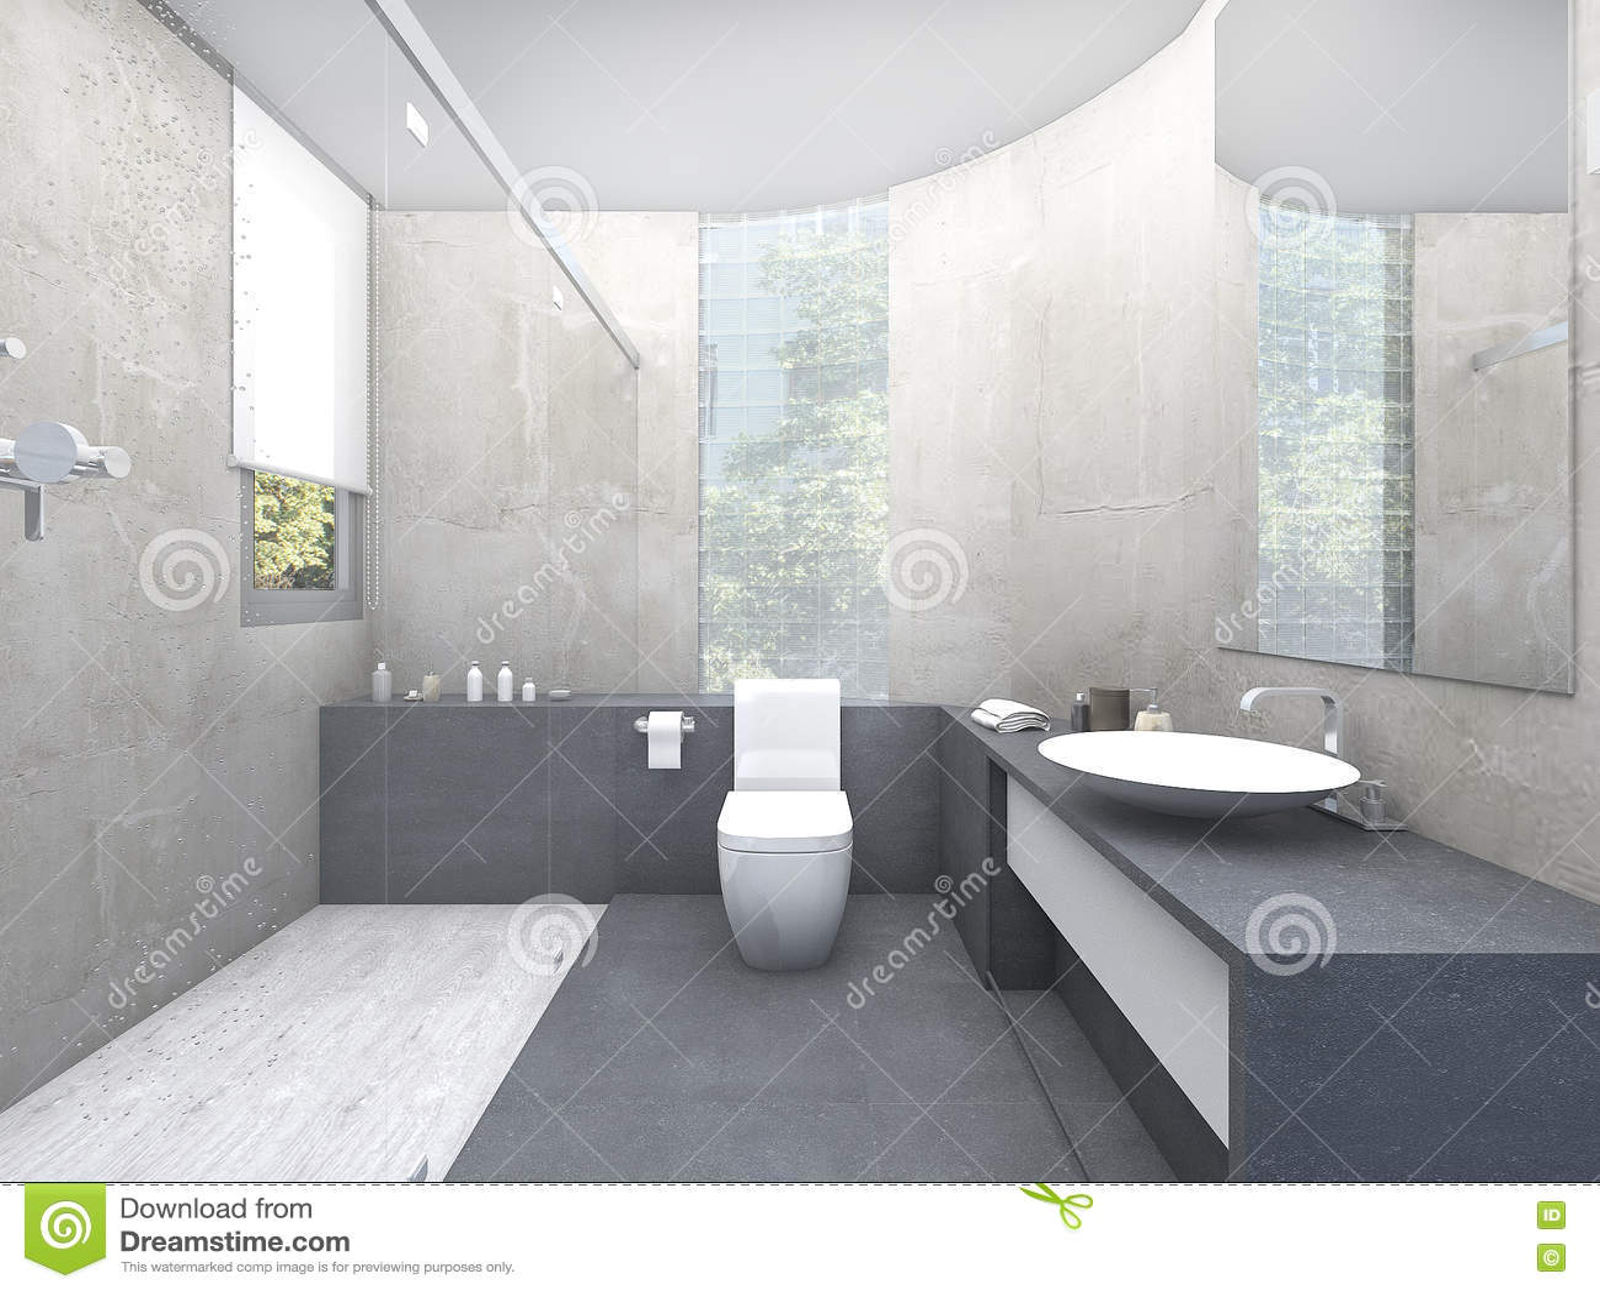 3d Rendering Beautiful Design Restroom With Glass Block Stock ...